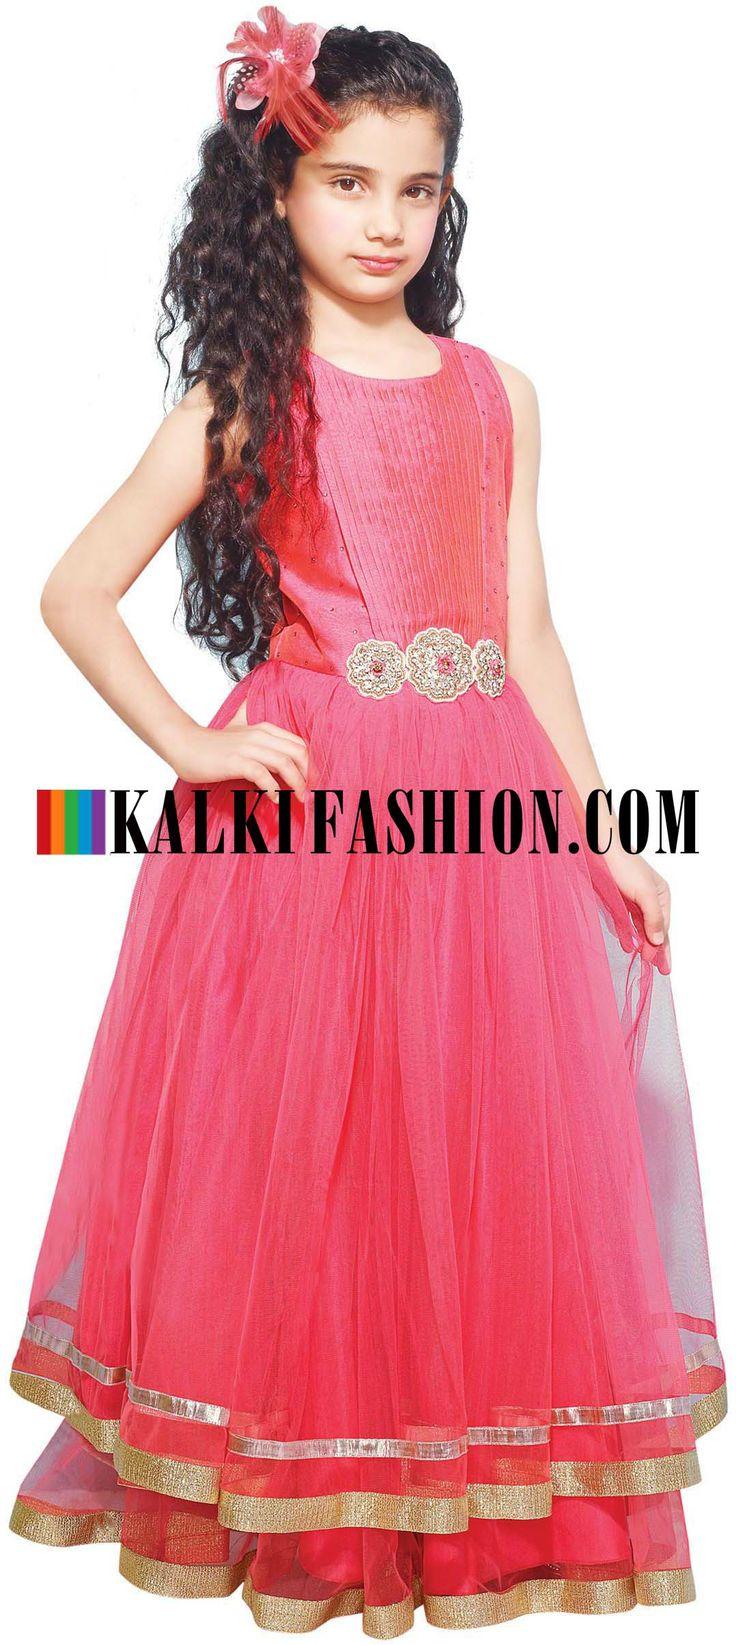 Kids clothing online international shipping